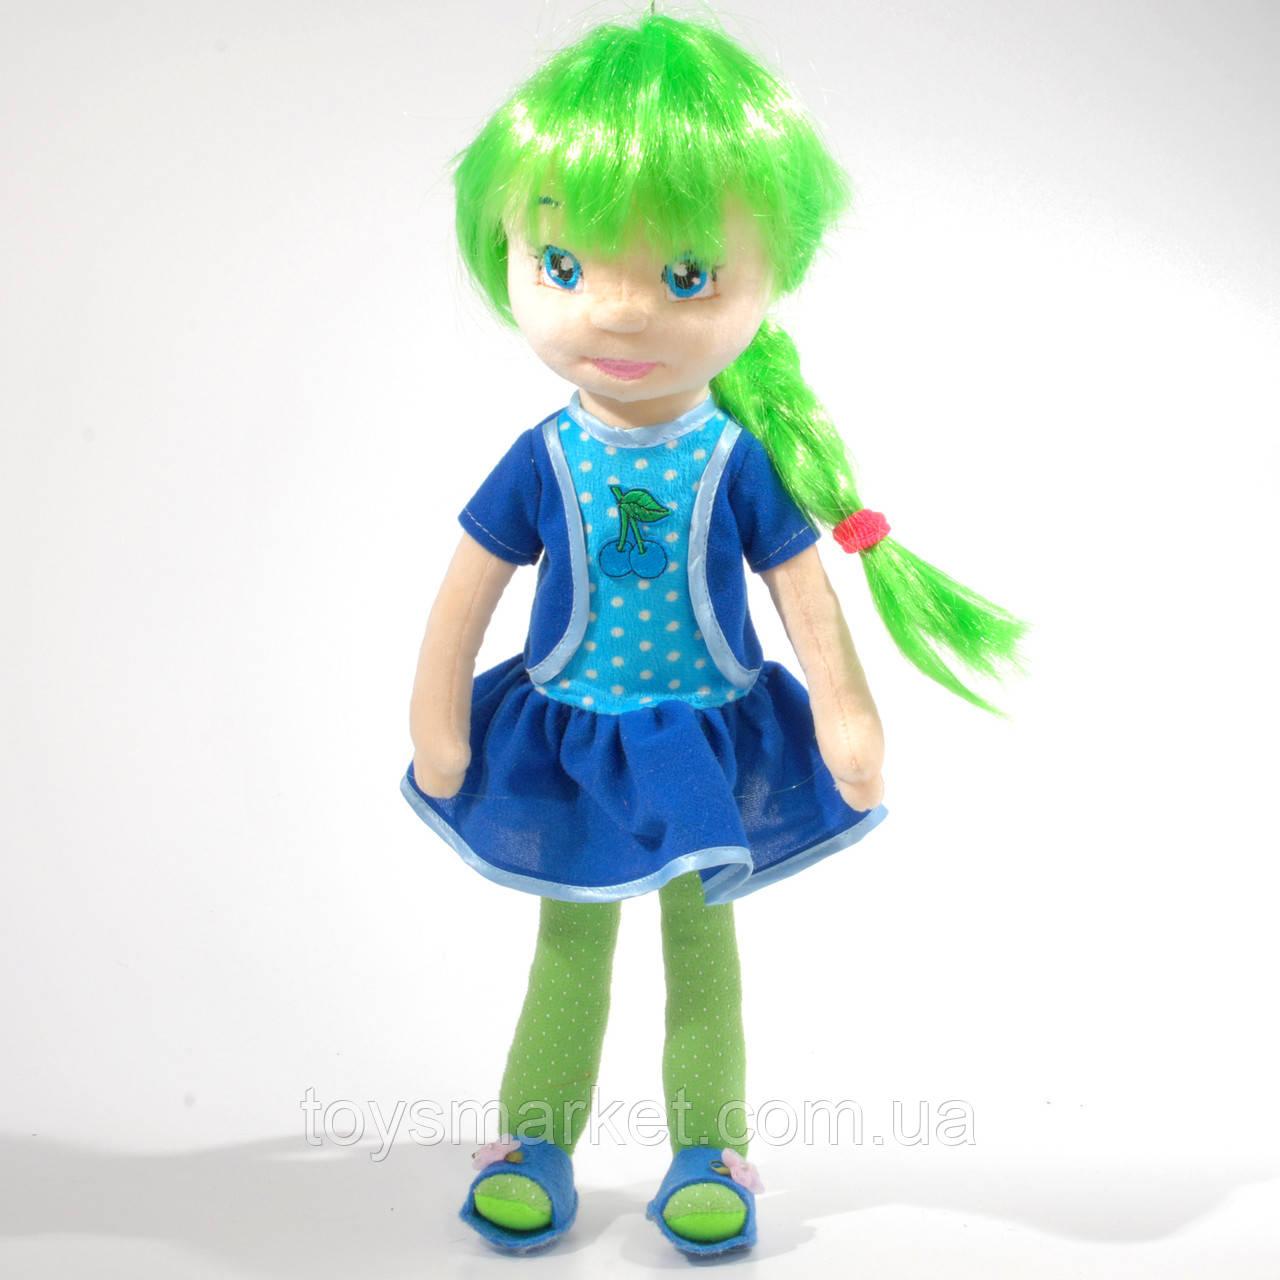 Детская игрушка кукла Моника